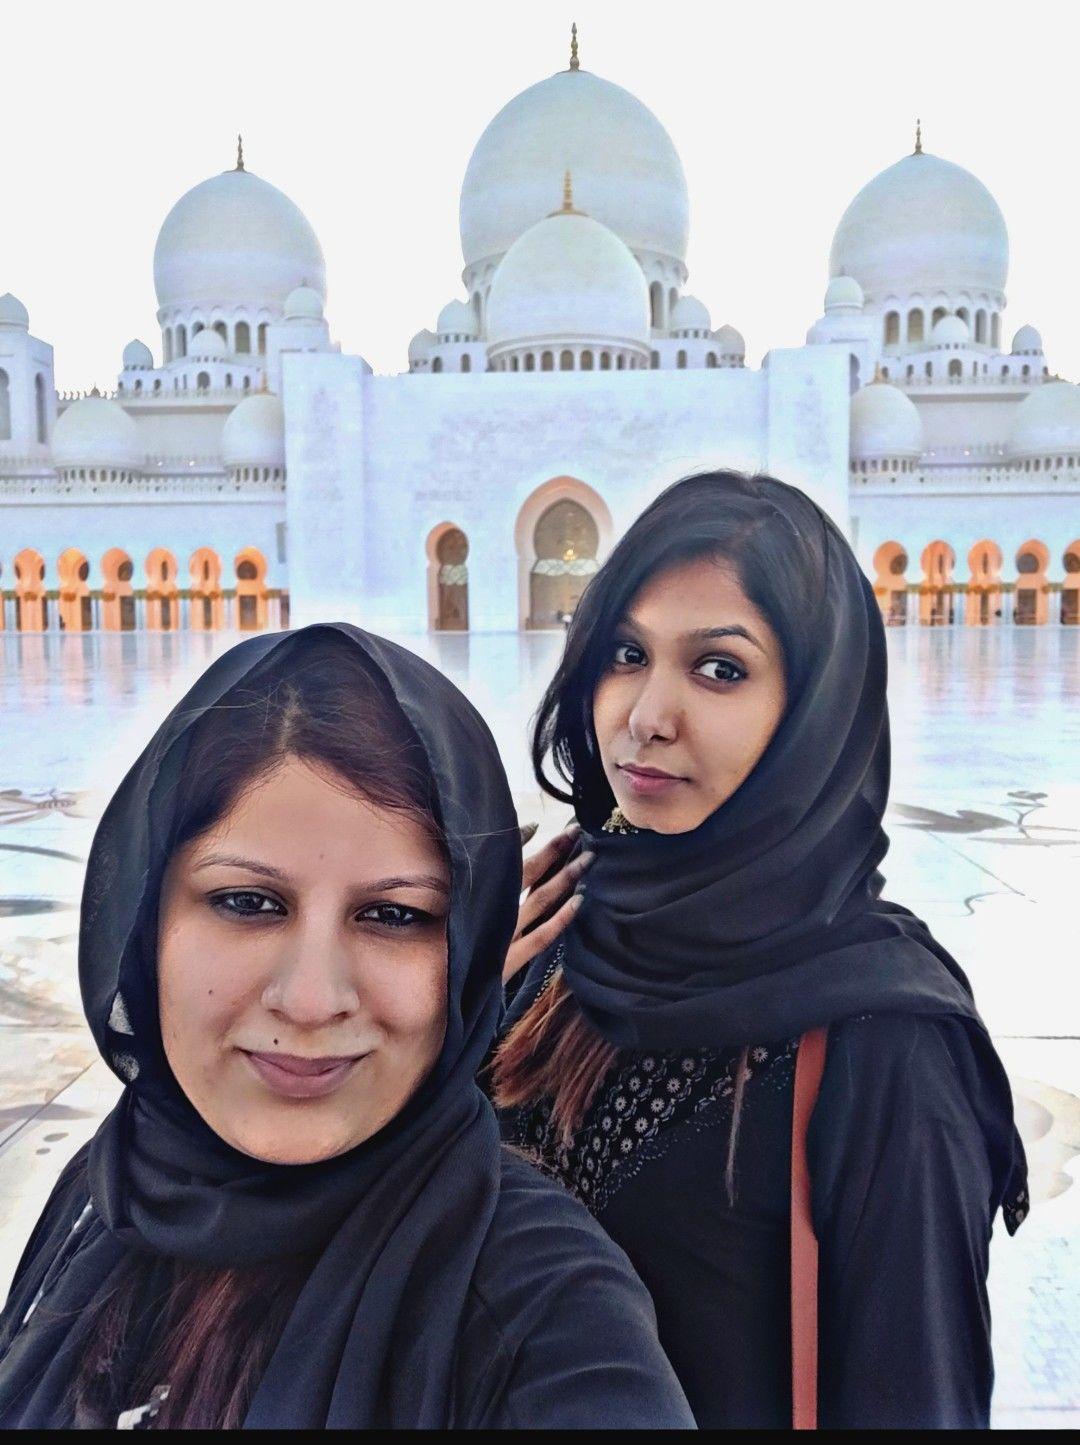 Photo of Sheikh Zayed Grand Mosque Center - Sheikh Rashid Bin Saeed St - Abu Dhabi - United Arab Emirates By Nidhi